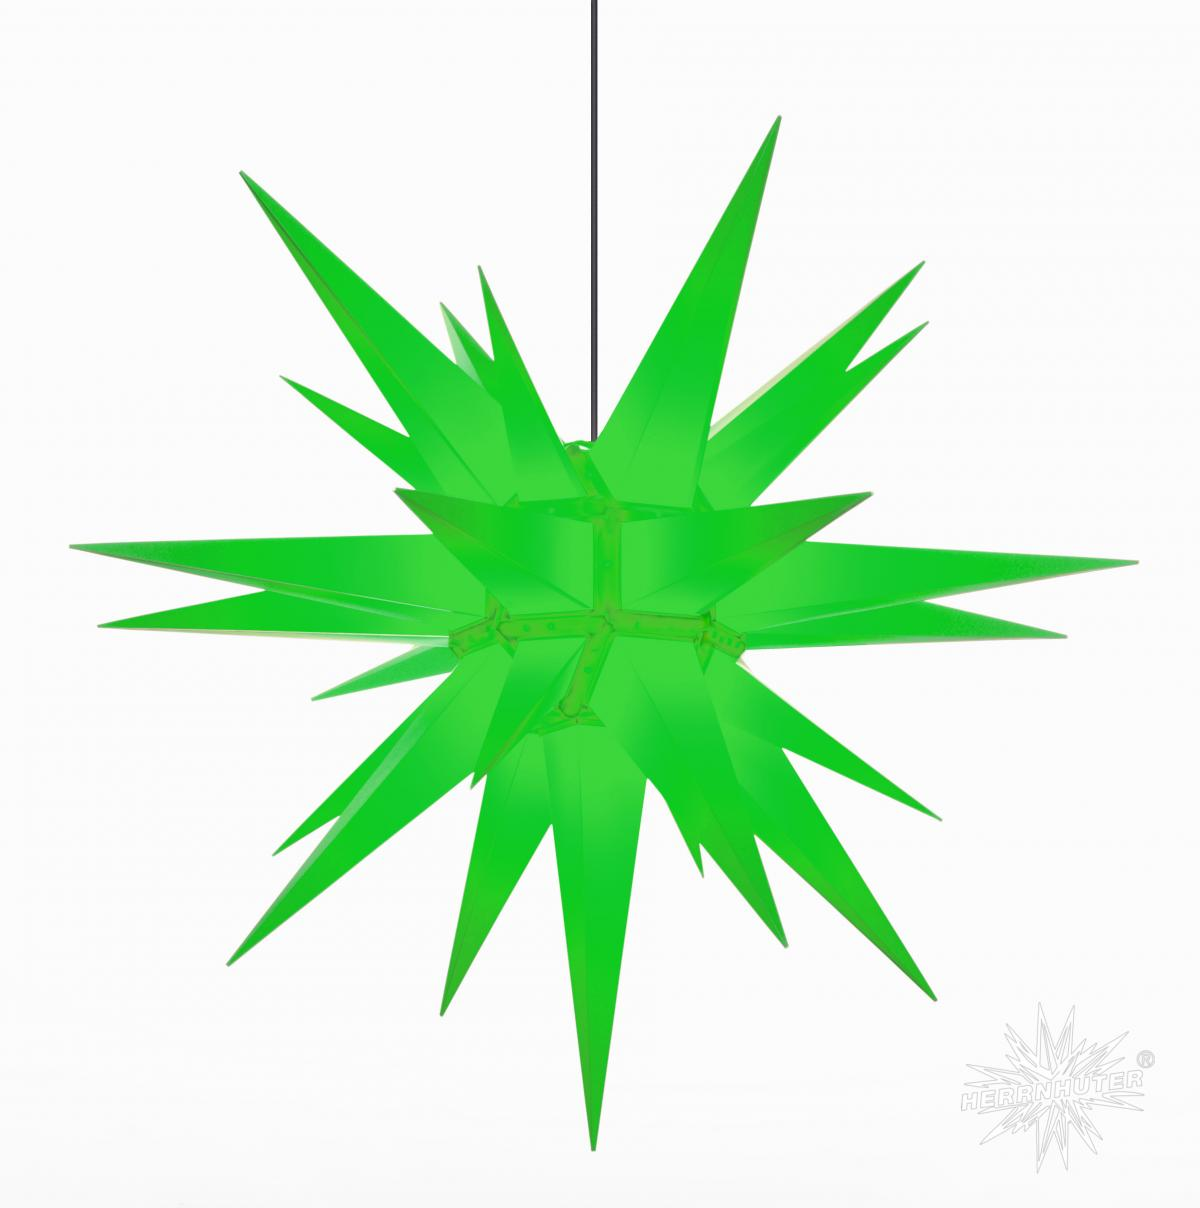 Herrnhuter Moravian star 130cm green